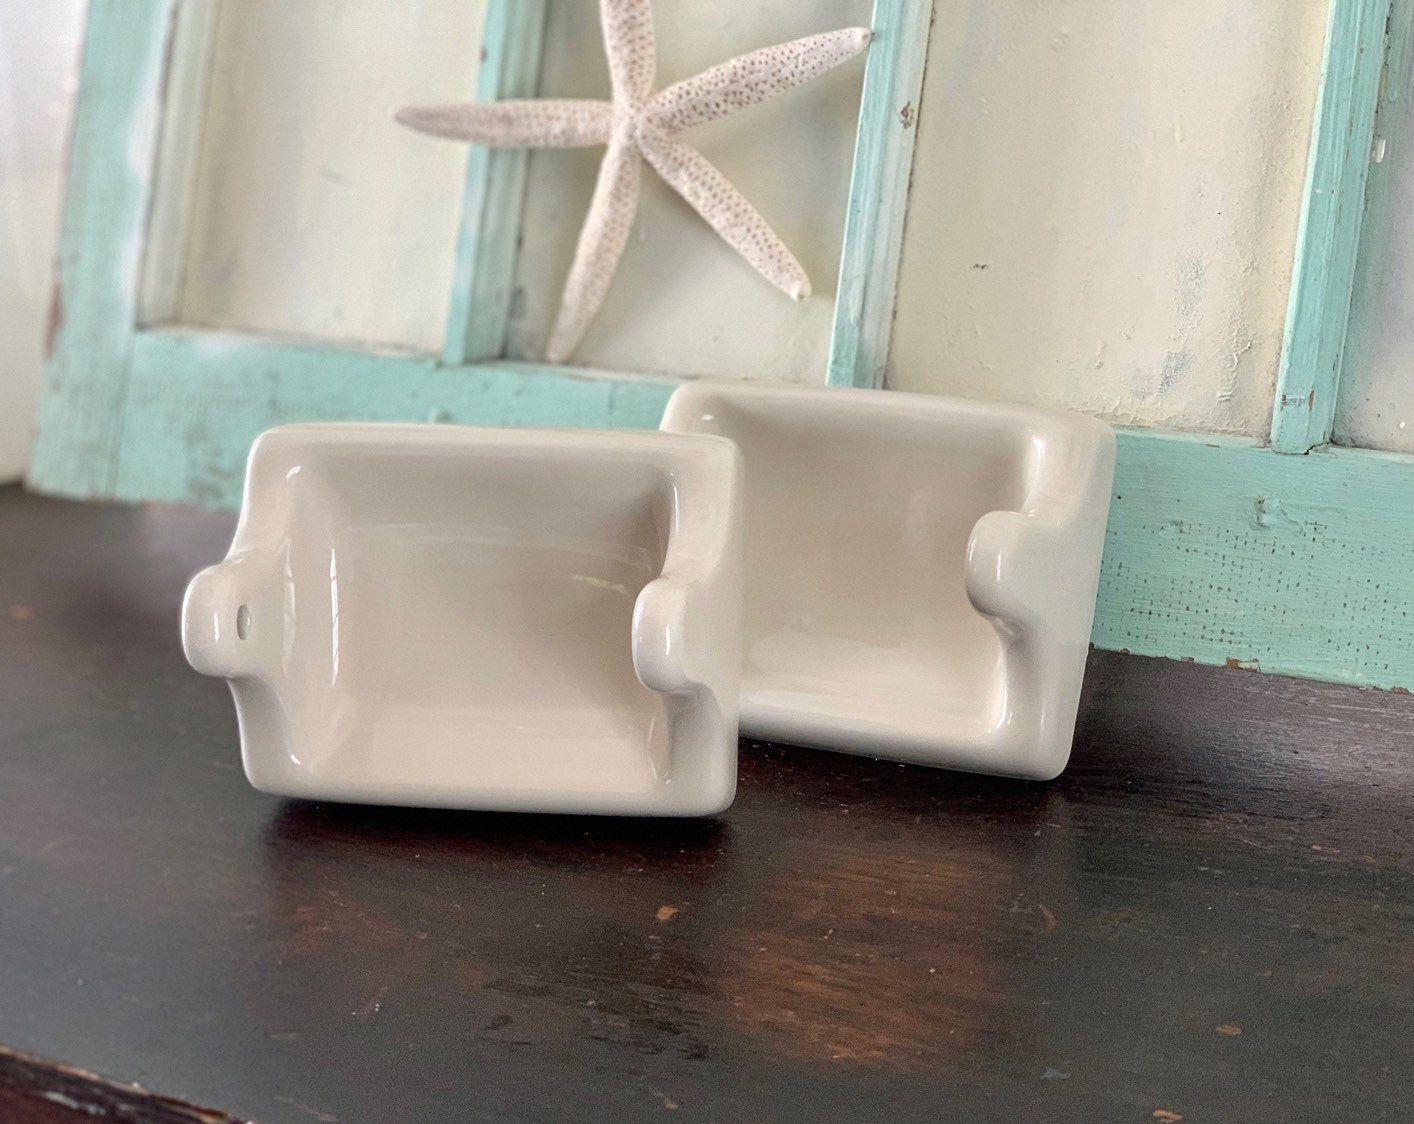 Photo of Toilet Paper Holder, Vintage Ceramic Bathroom Fixtures, Midcentury Bathroom Fixtures, Vintage Ceramic Toilet Paper Holder, Wall Mount